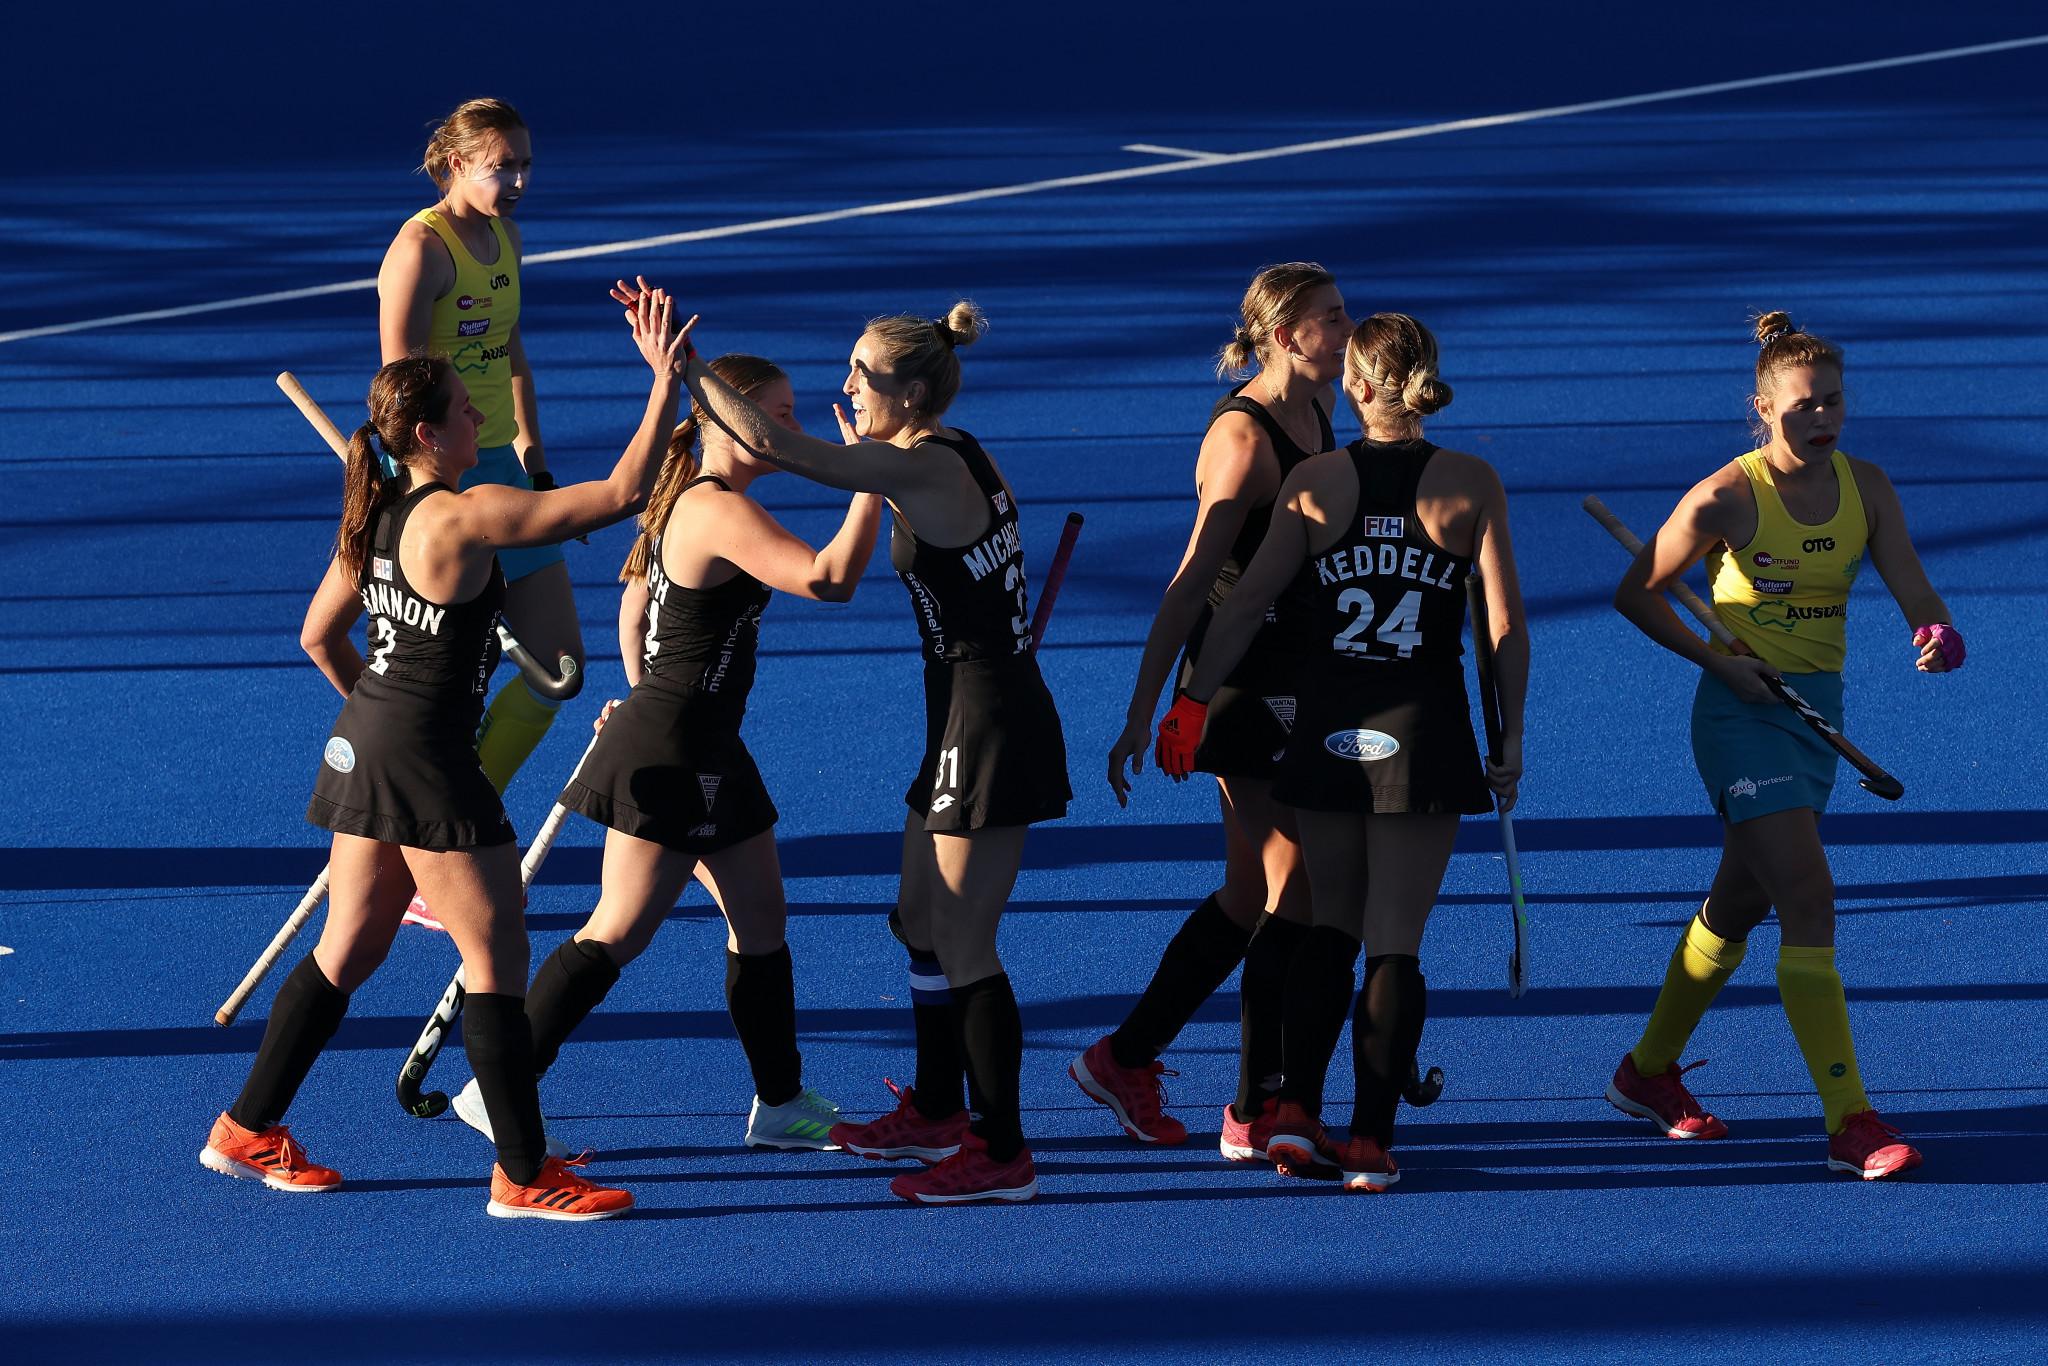 New Zealand and Australia make FIH Hockey Pro League return after COVID-19 break